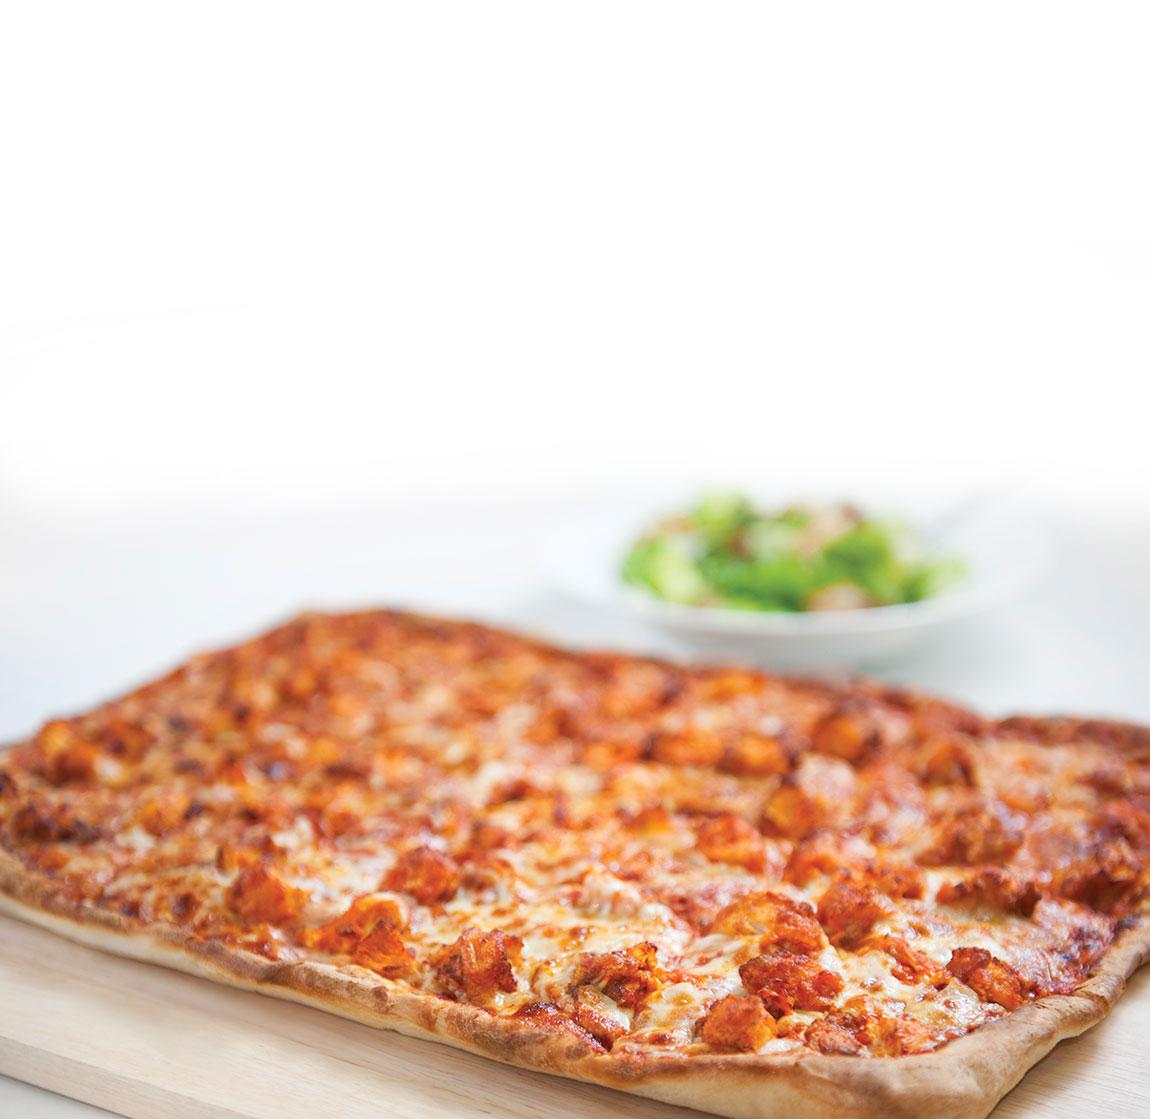 Buffalo Chicken Pizza on a cutting board.